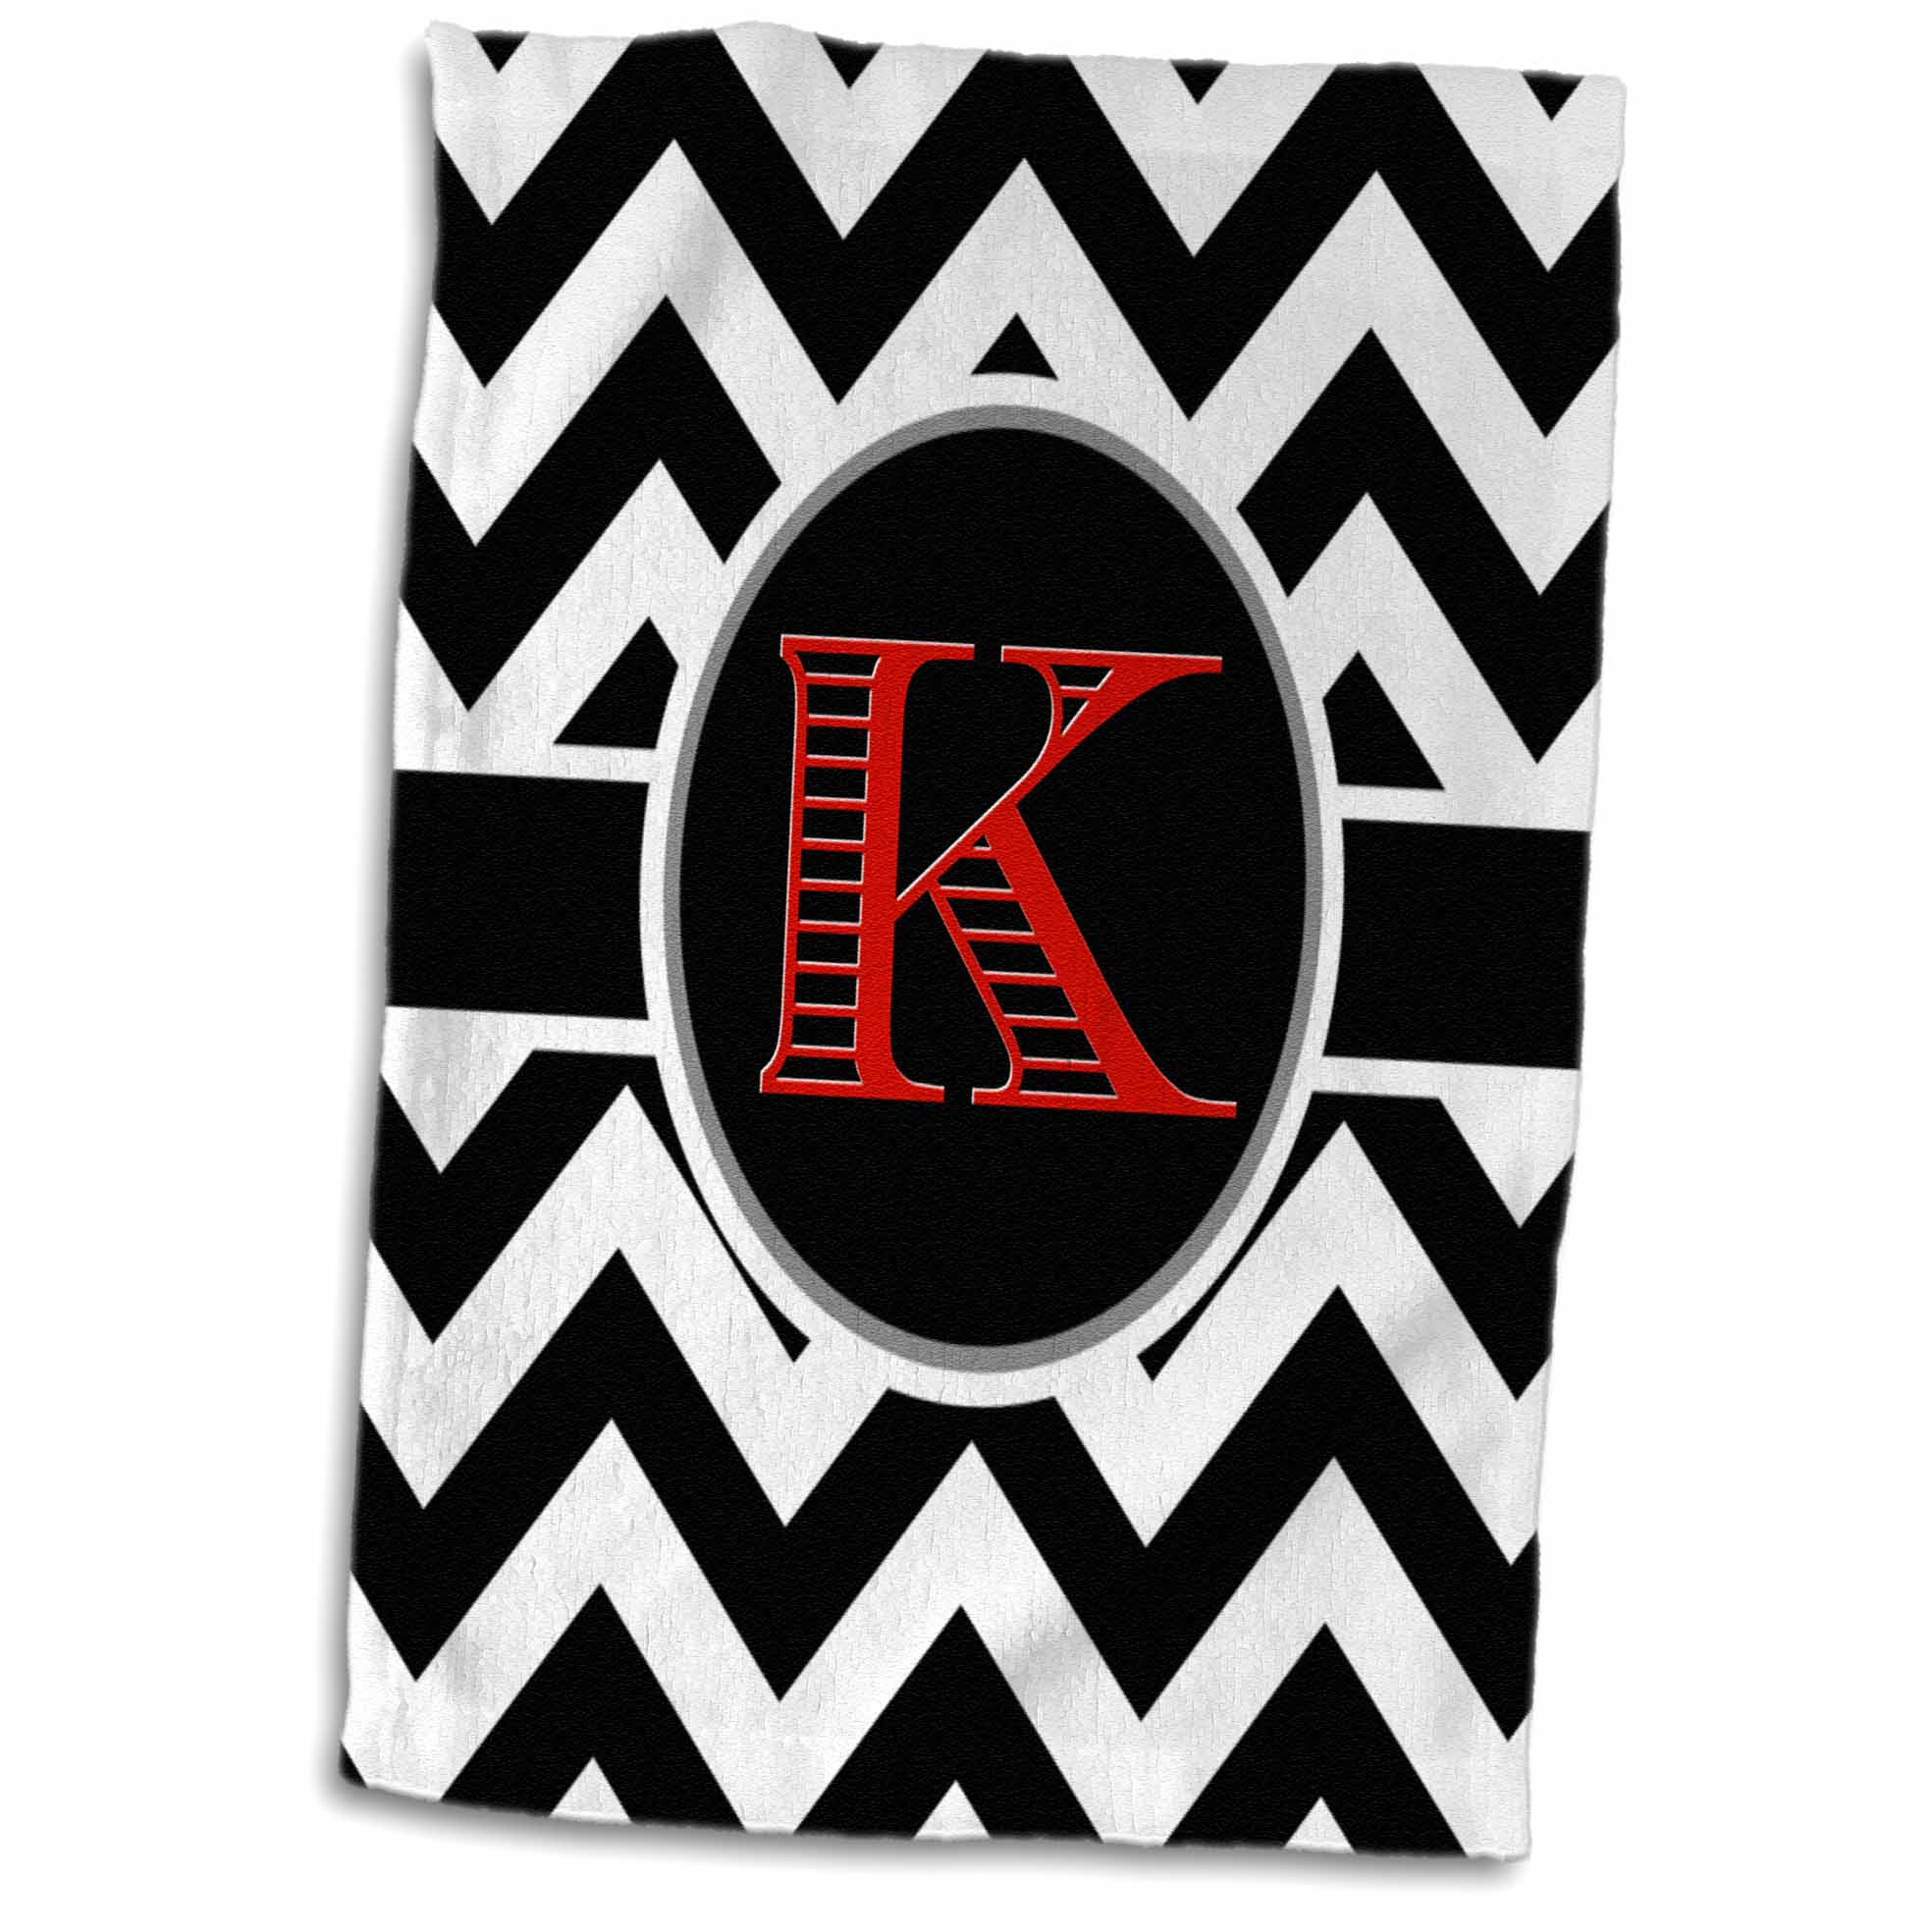 3D Rose Black and White Chevron Monogram Red Initial K Hand Towel 15 x 22